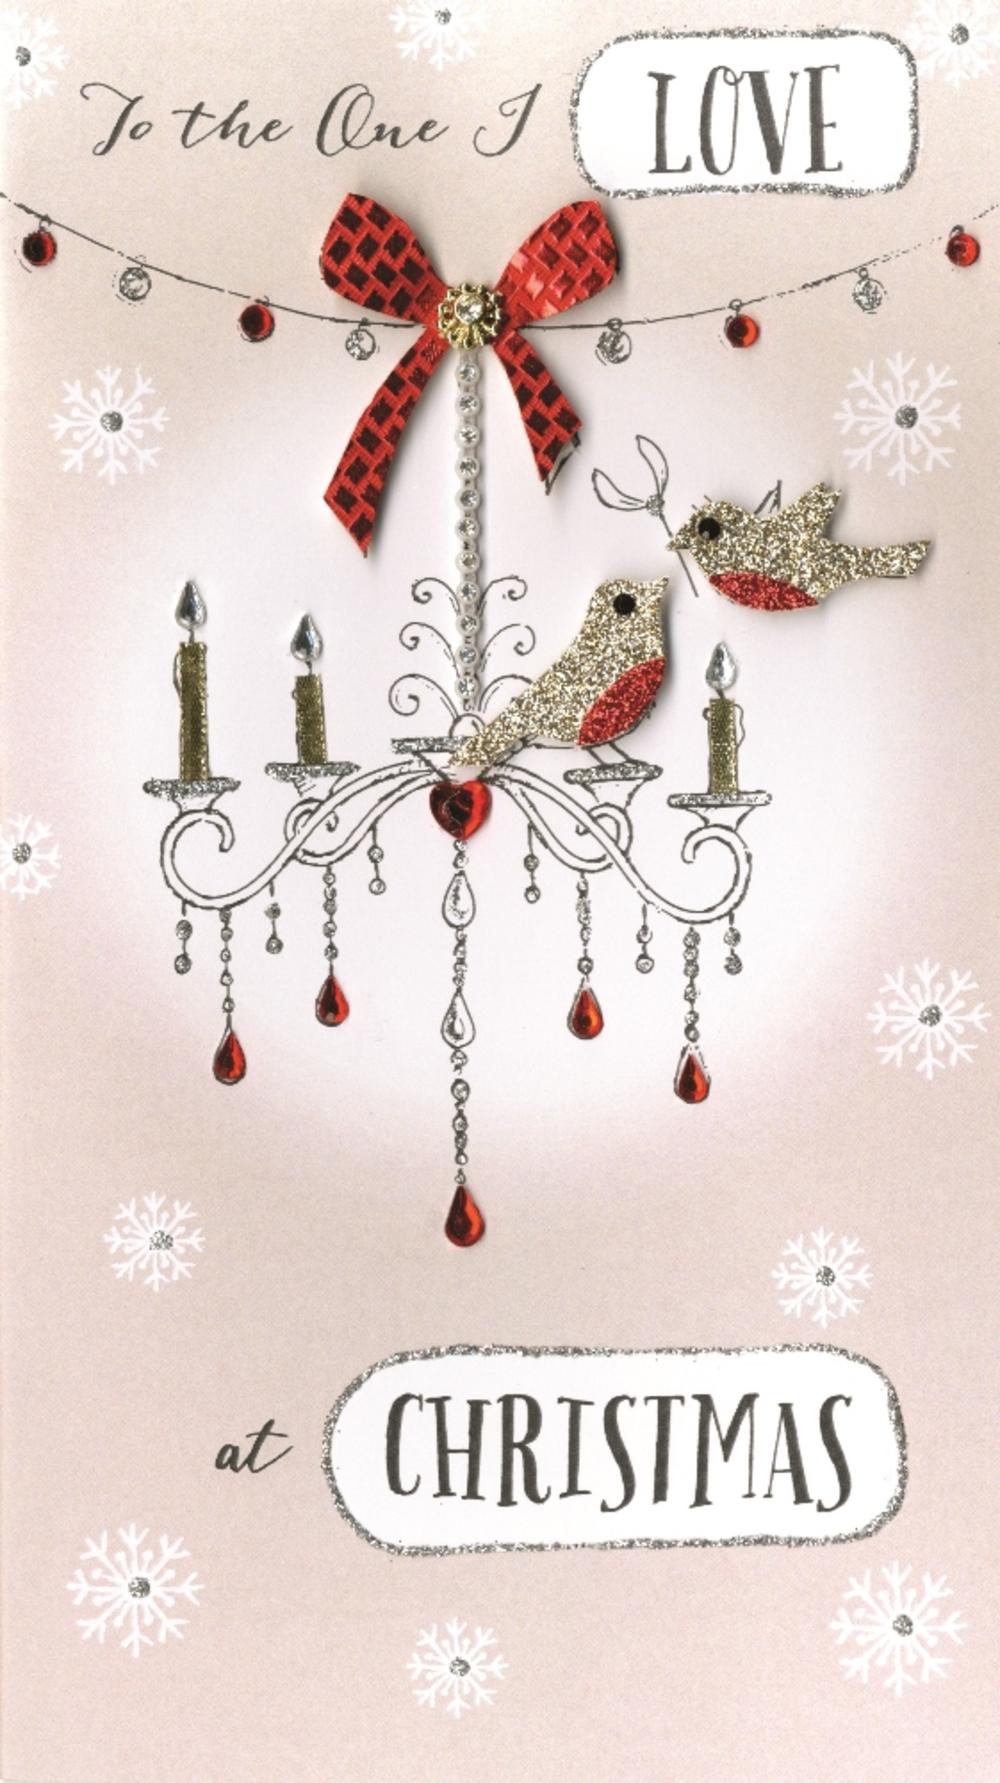 One I Love Embellished Christmas Card